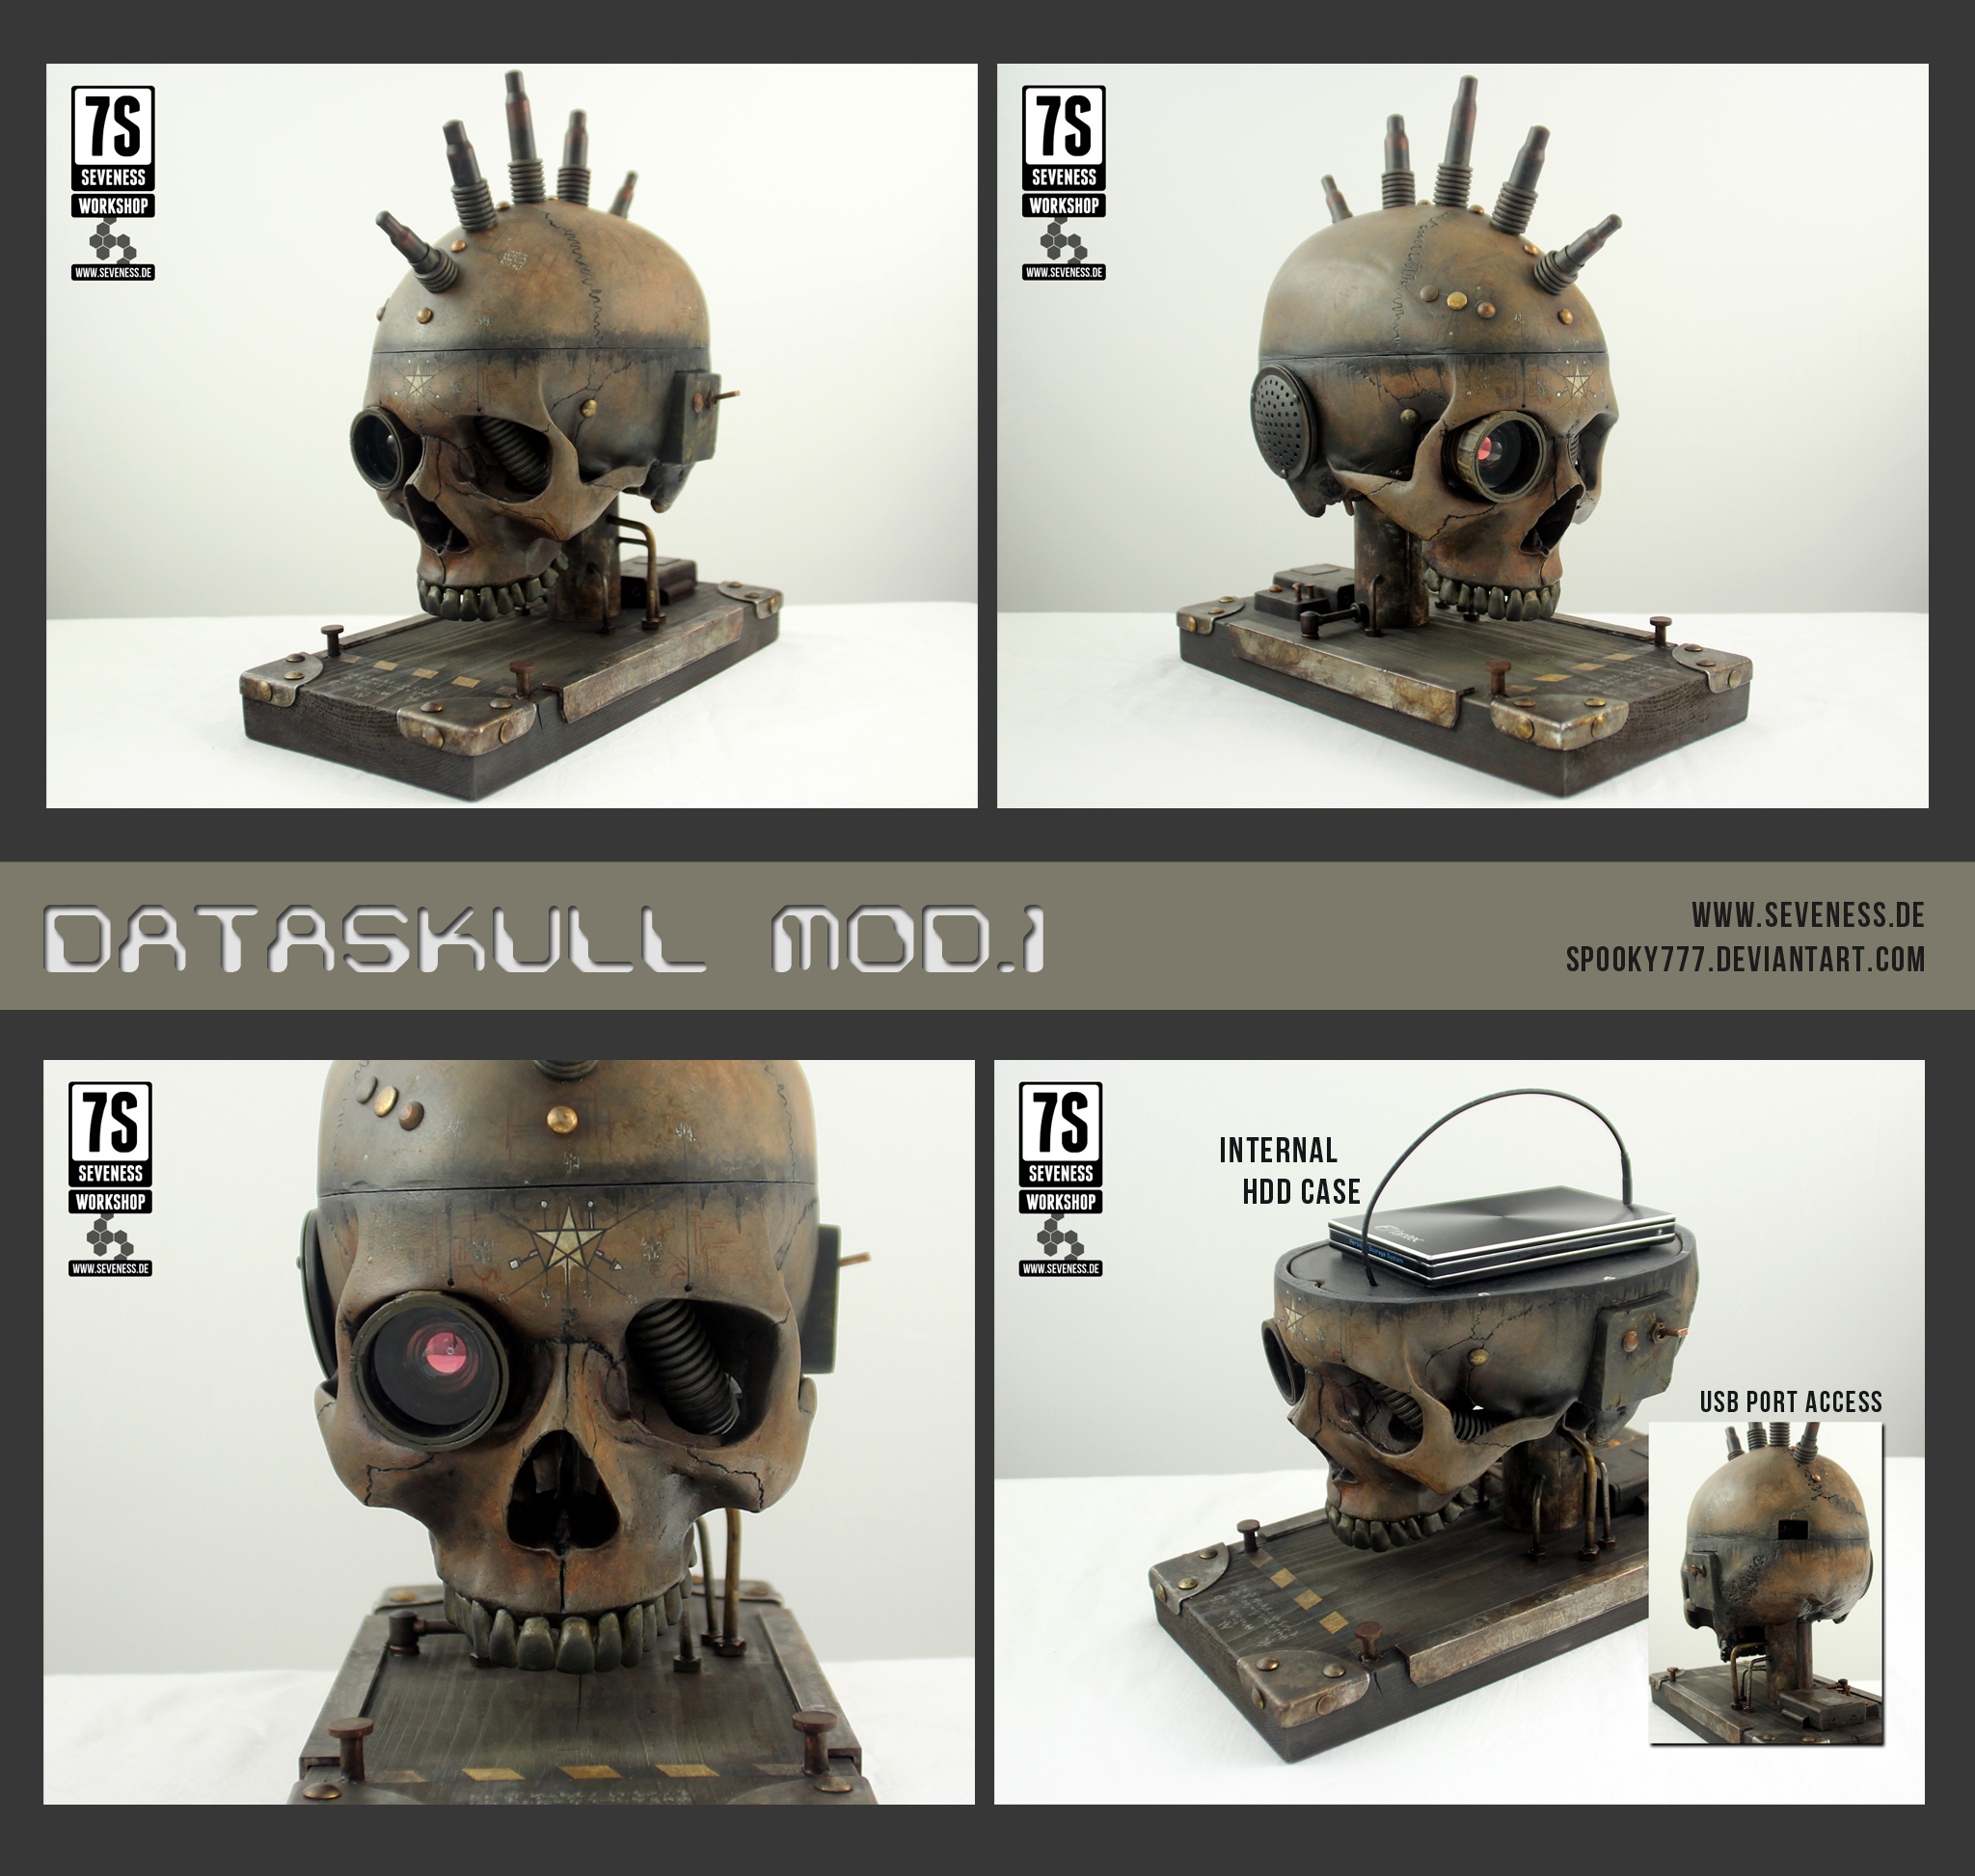 Dataskull mod.1 by SpOoKy777